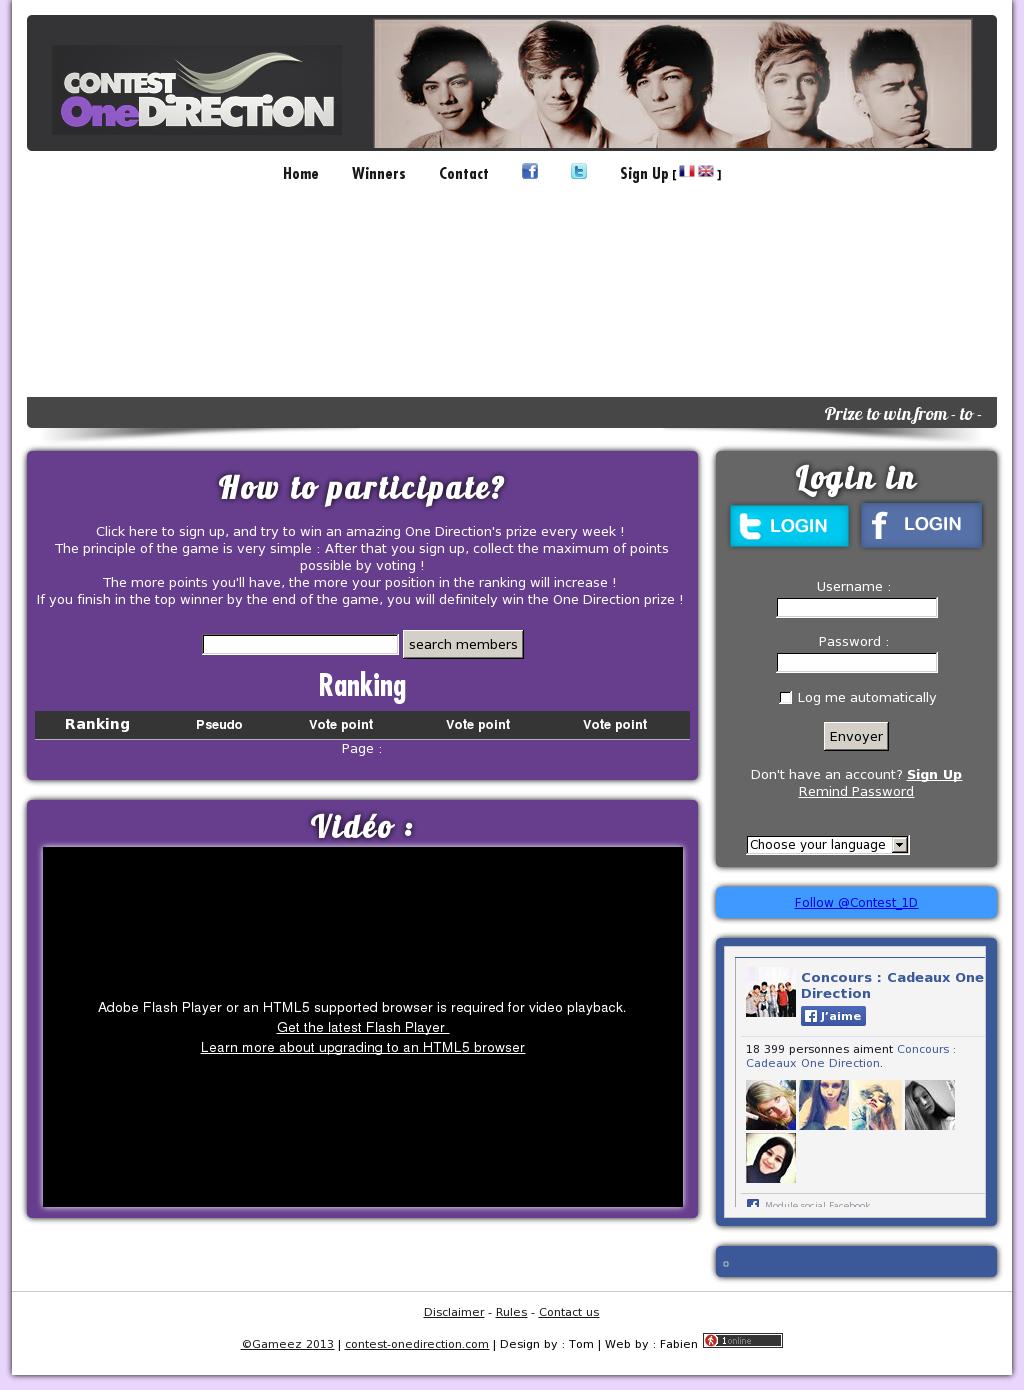 Concours : Cadeaux One Direction Competitors, Revenue and